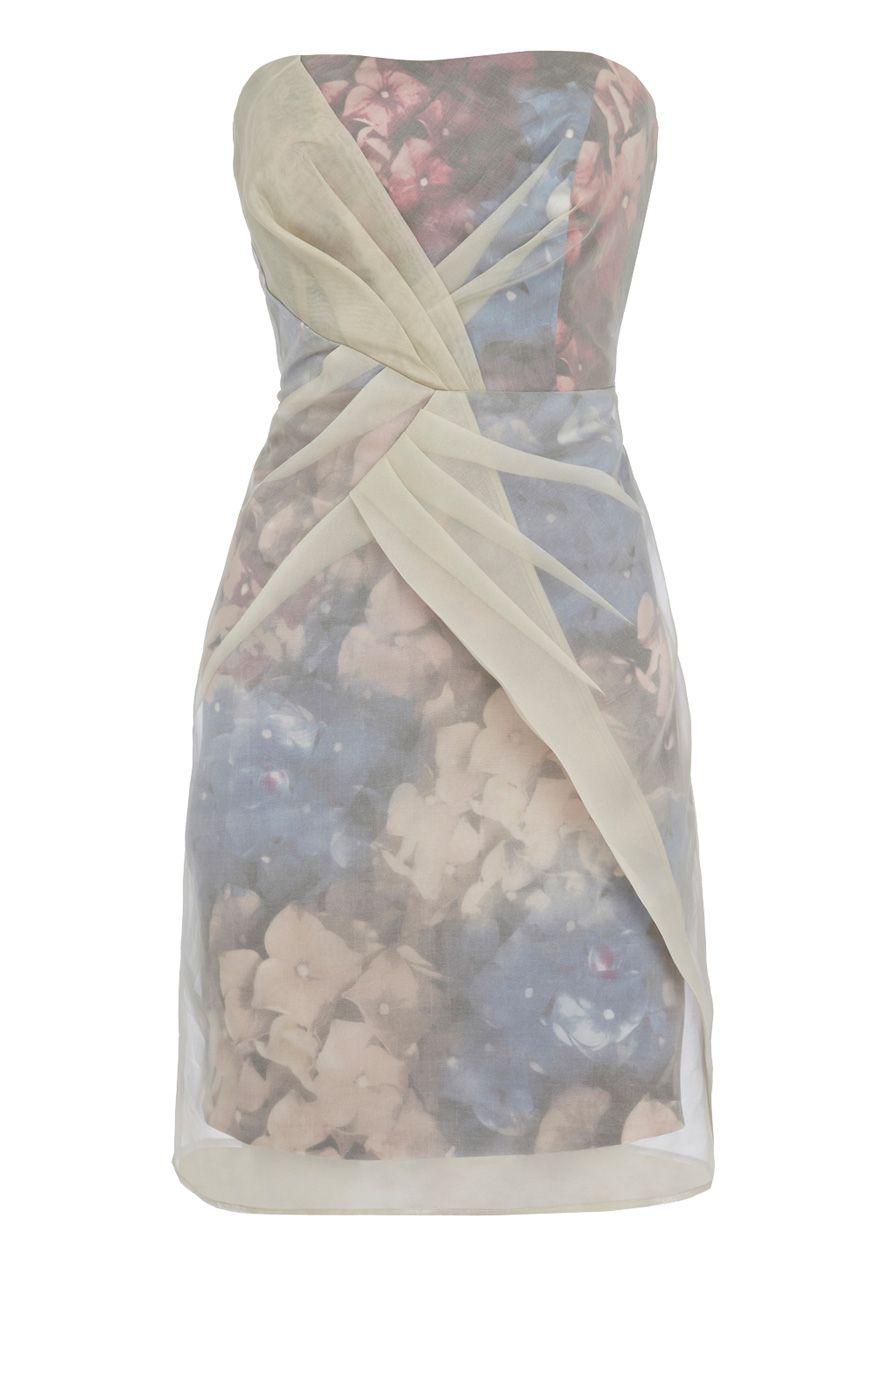 Karen Millen Strapless Layered Dress Multicolour [#KMM097] - $84.66 :